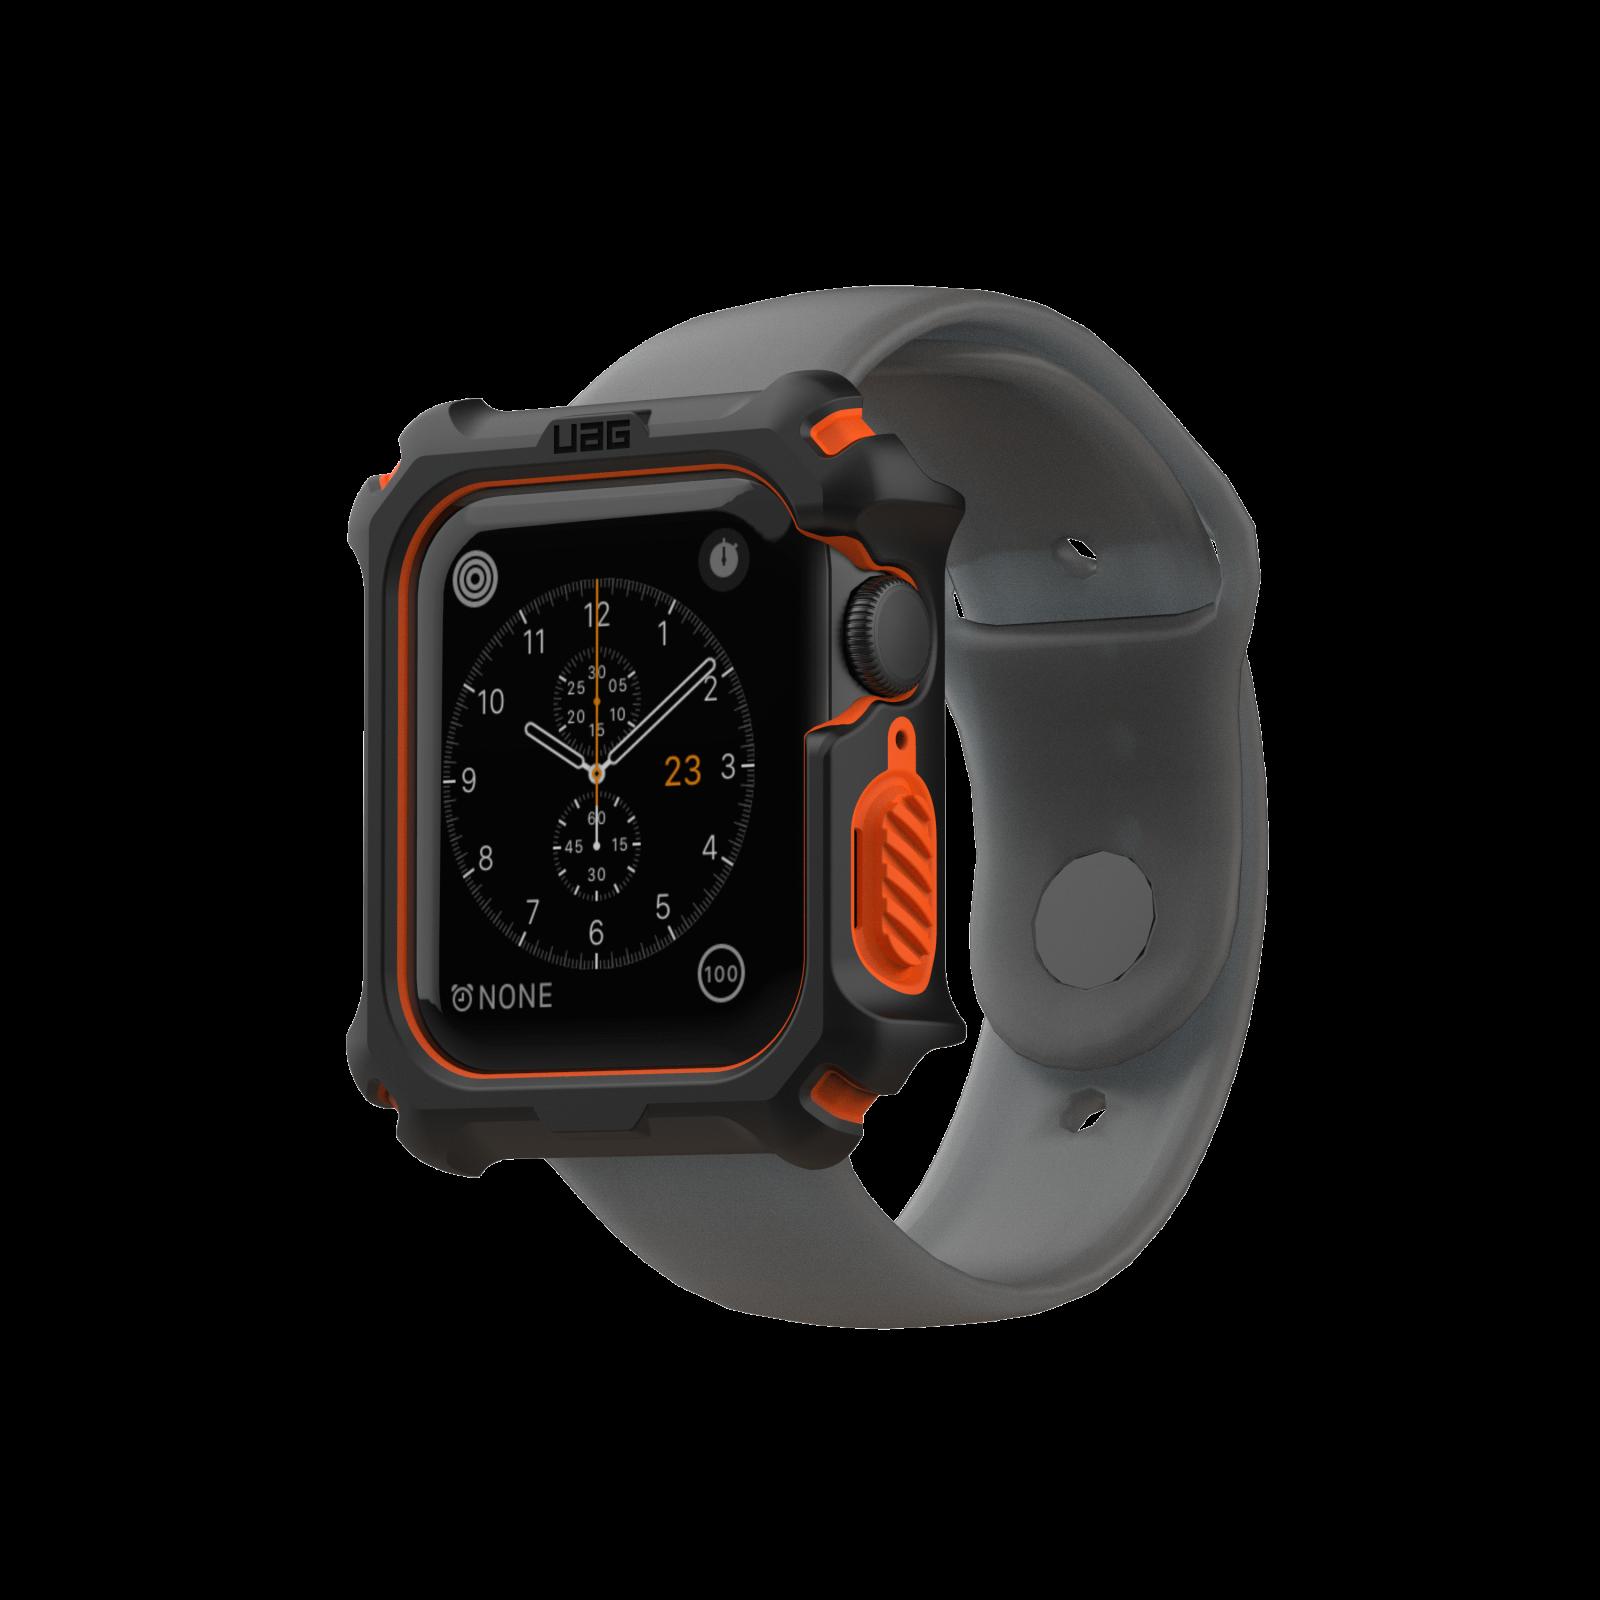 Case Apple Watch UAG Black/Orange 44MM OEM